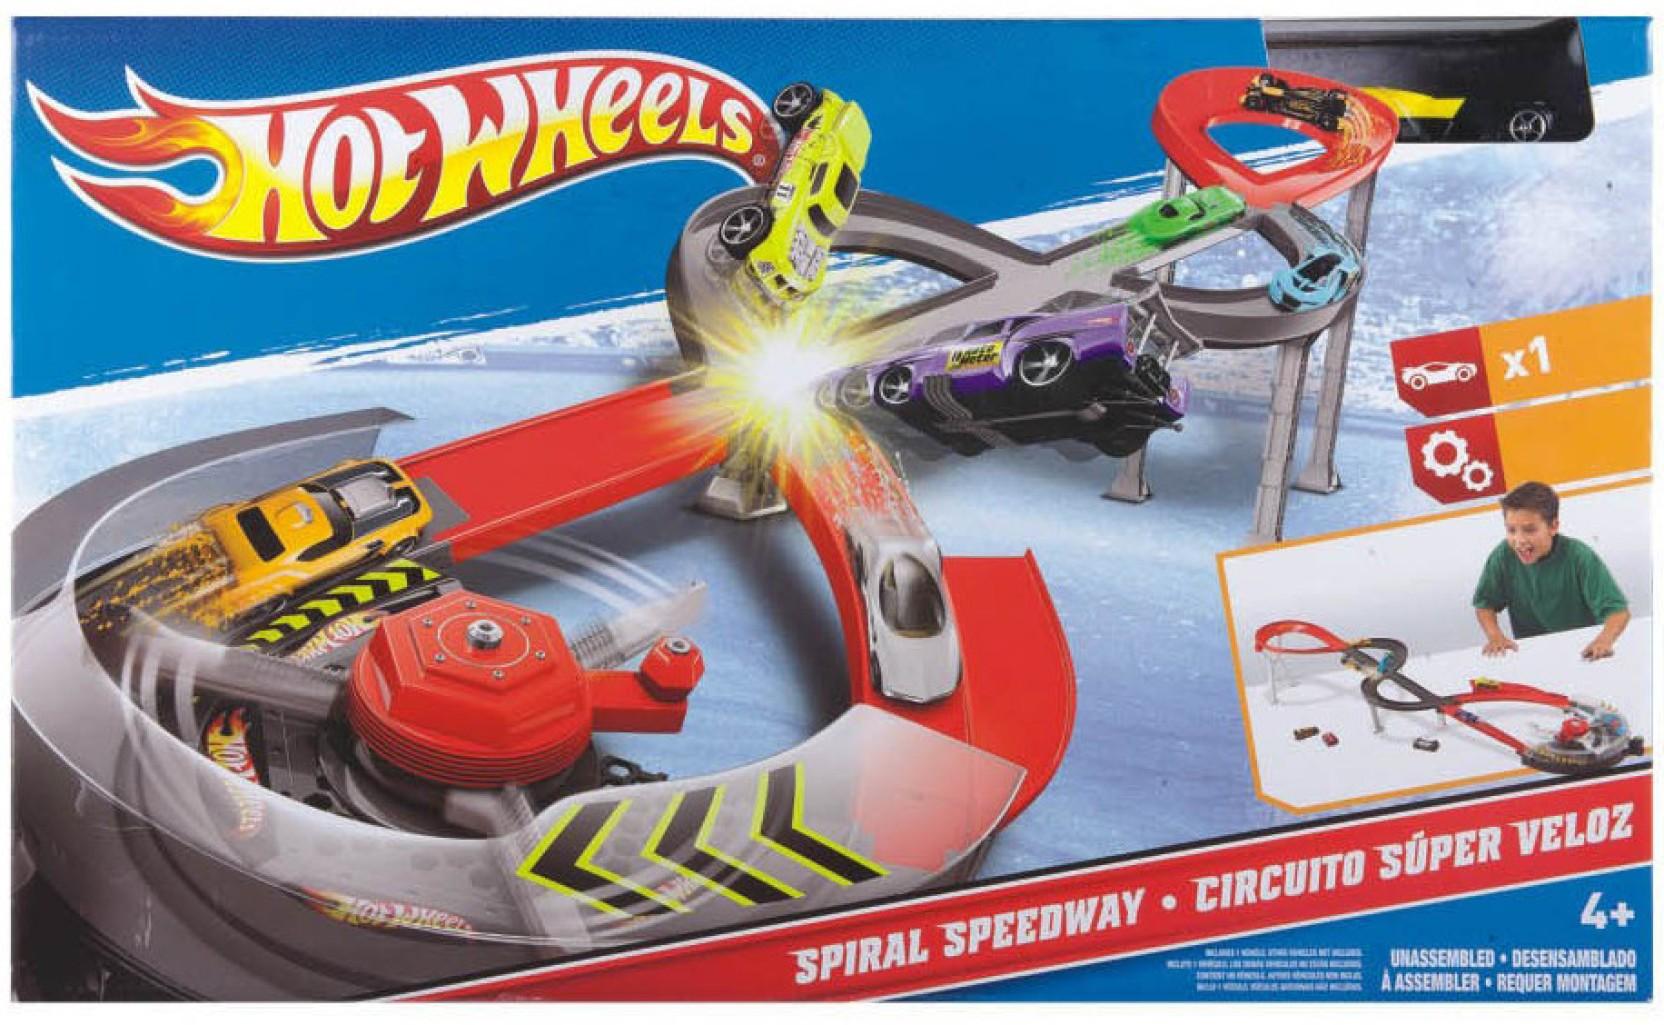 Circuito Hot Wheels : Hot wheels spiral speedway set spiral speedway set shop for